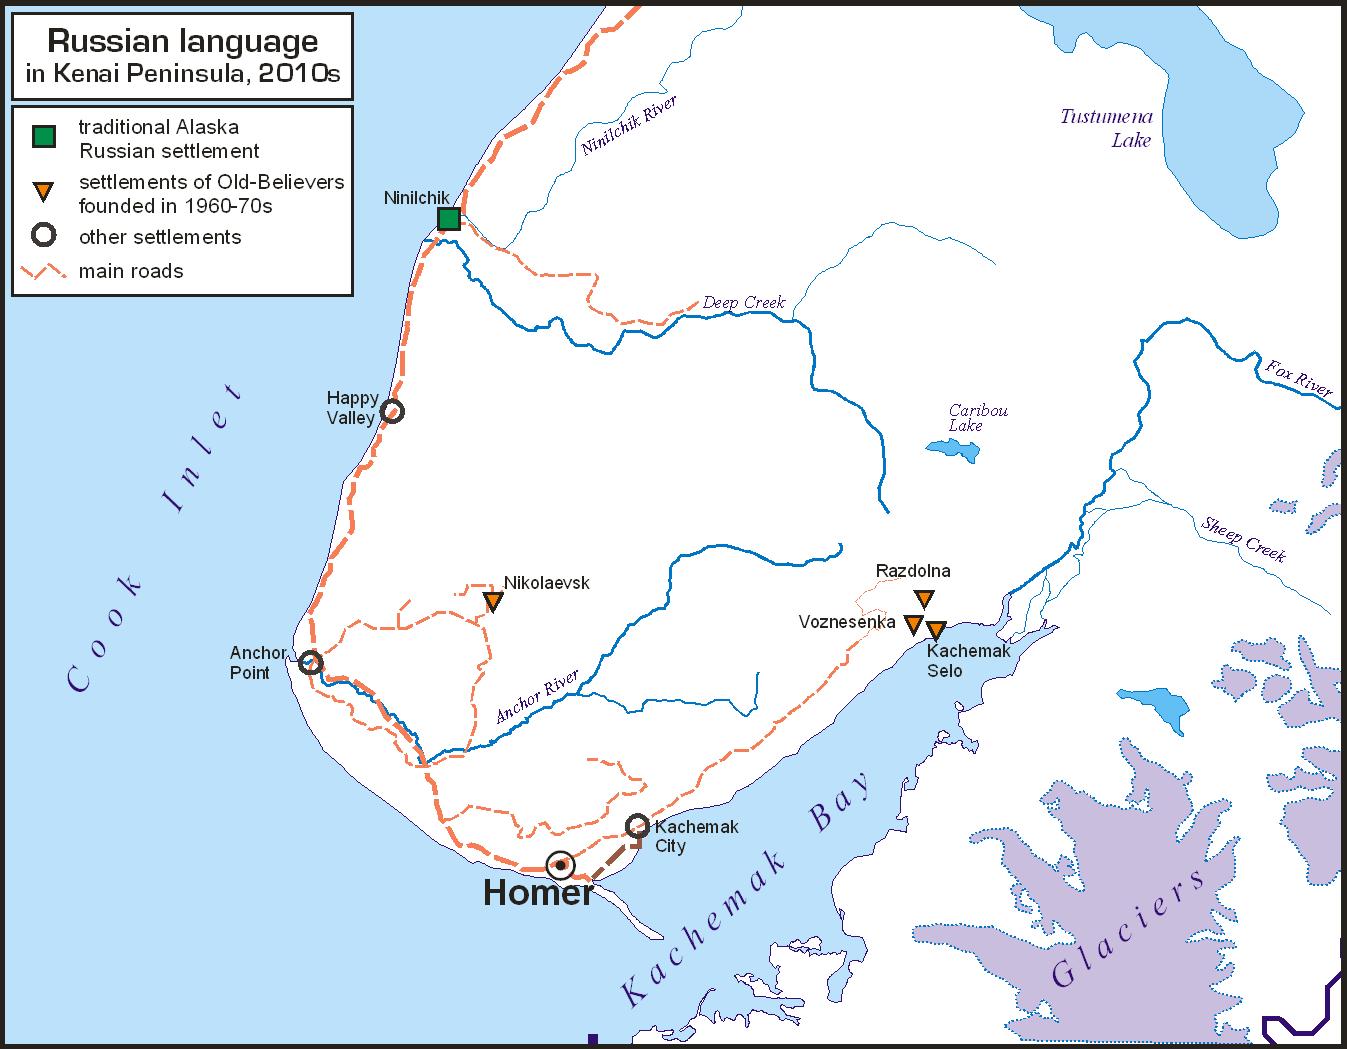 Russian language in Kenai Peninsula